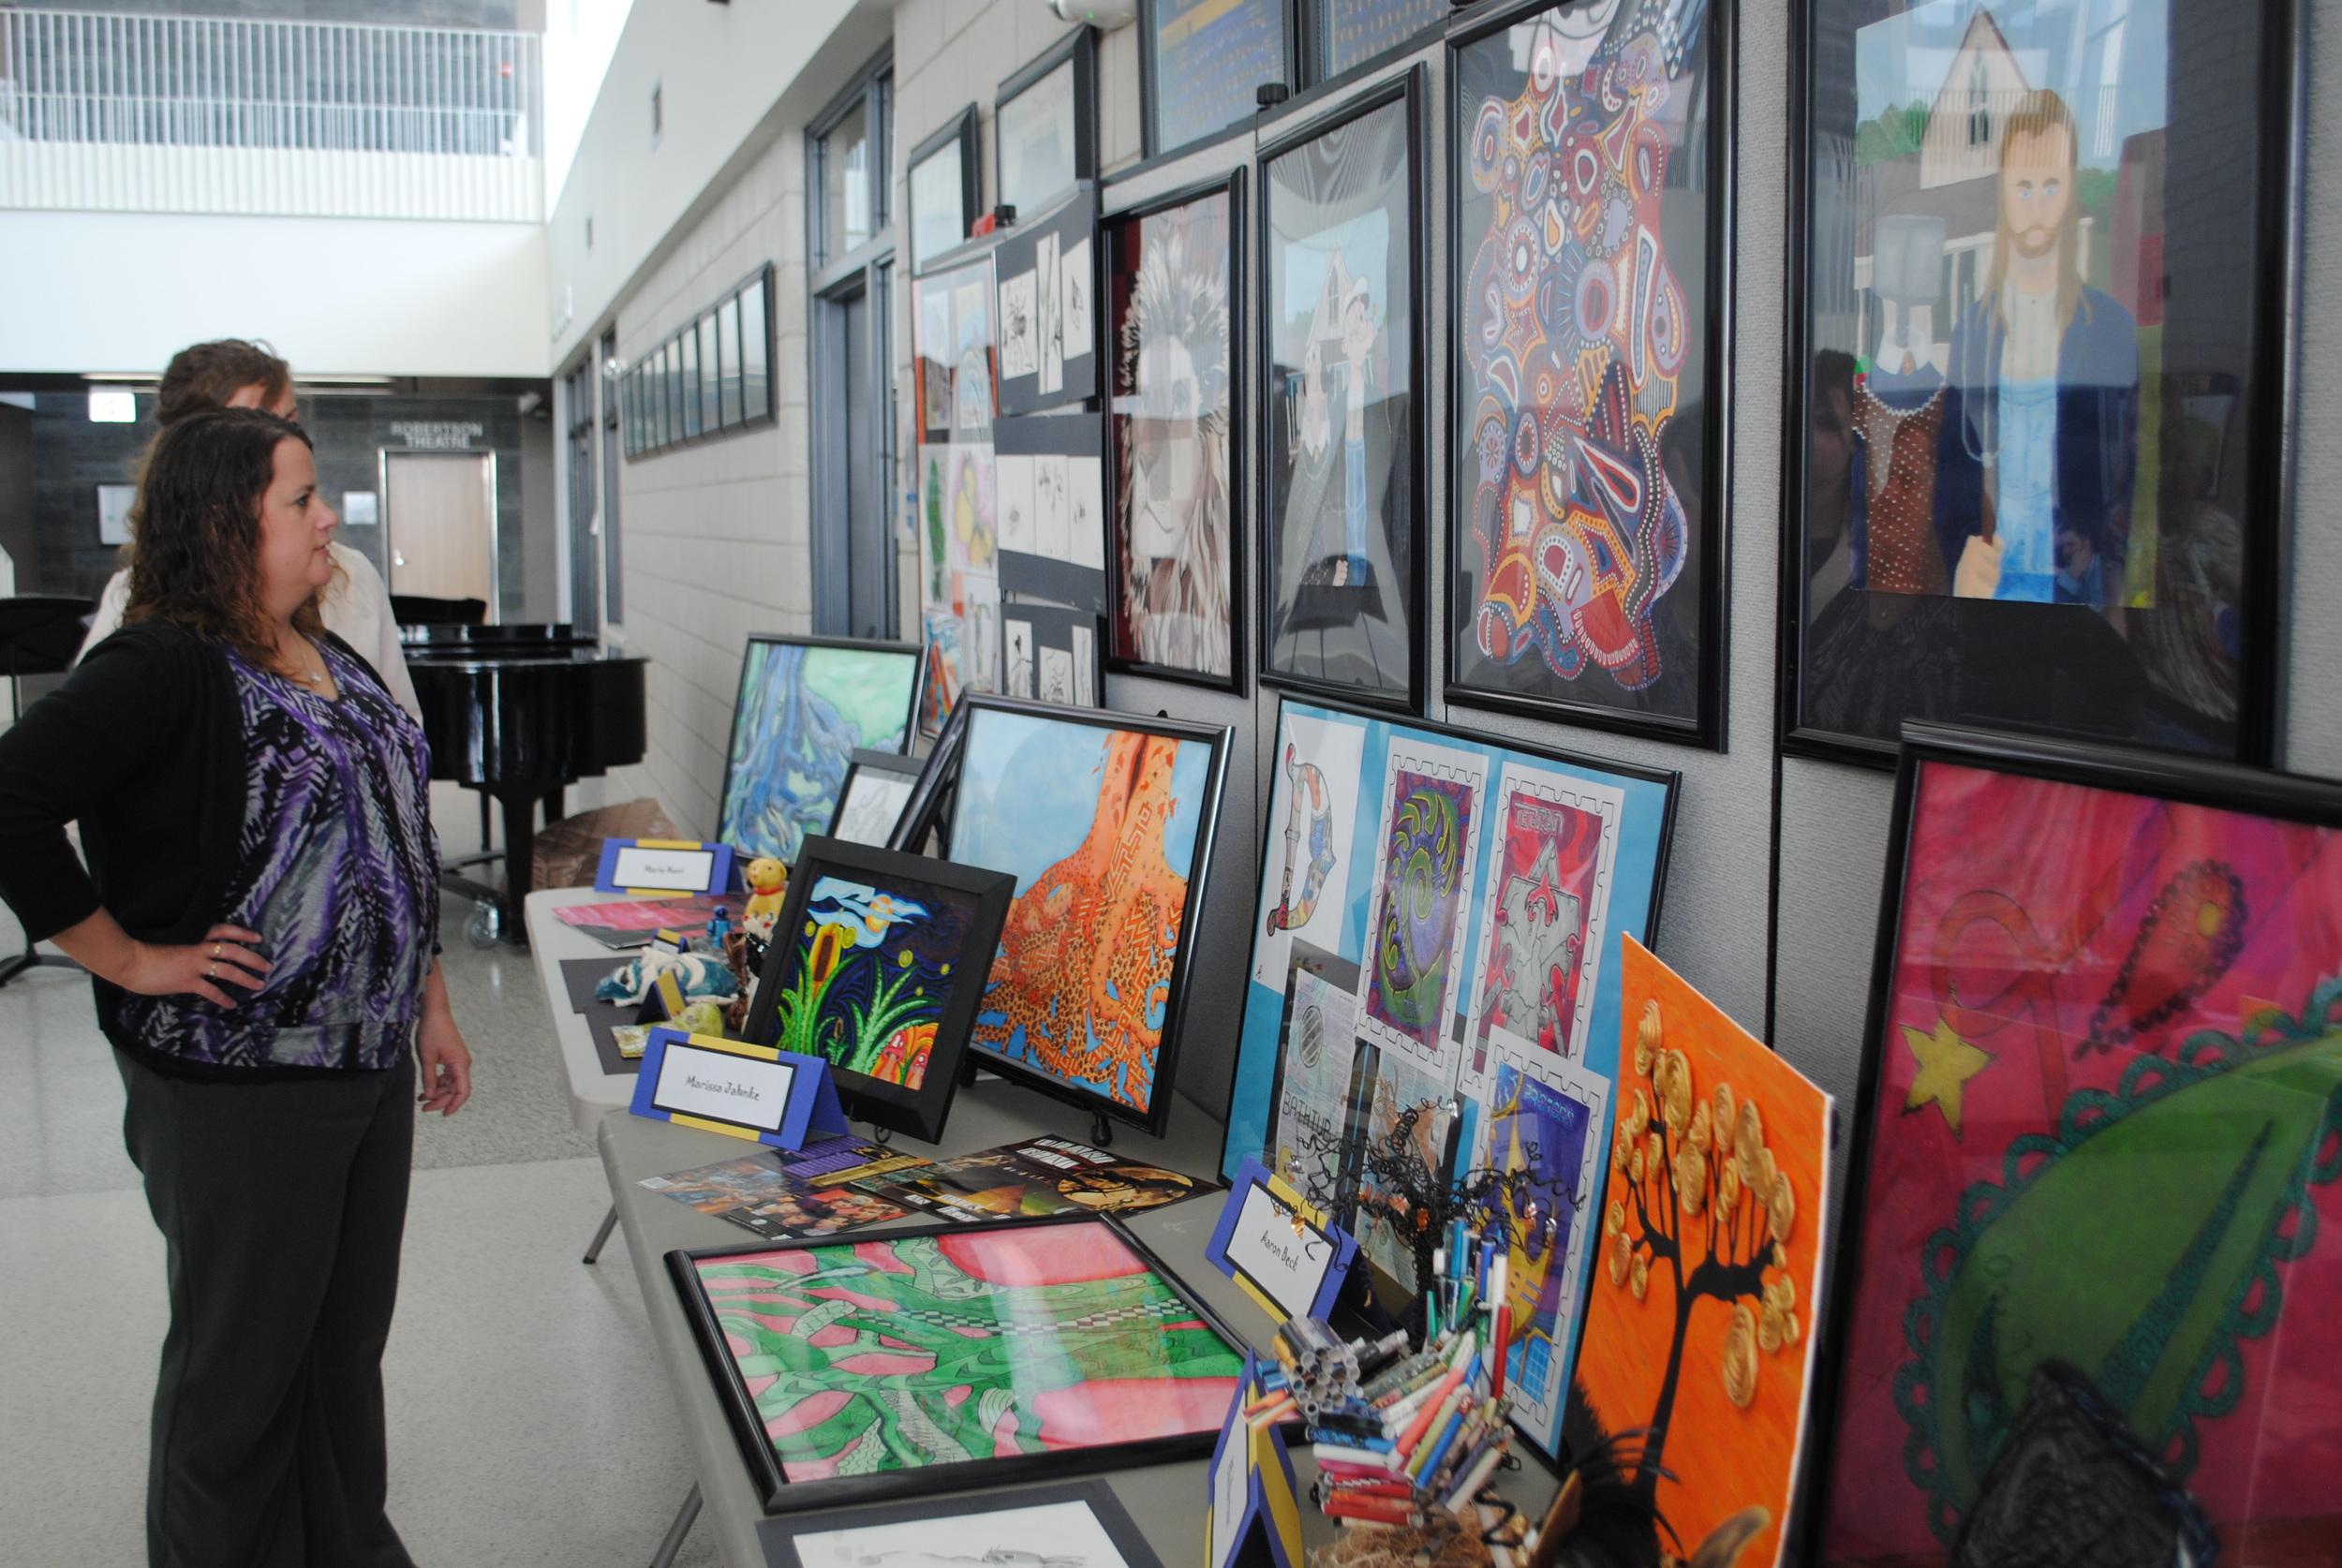 At the fine arts banquet, WDC Visual Arts Teacher Laurie Kopischke-Pulju set up an interesting display of students' artwork for parents to enjoy.